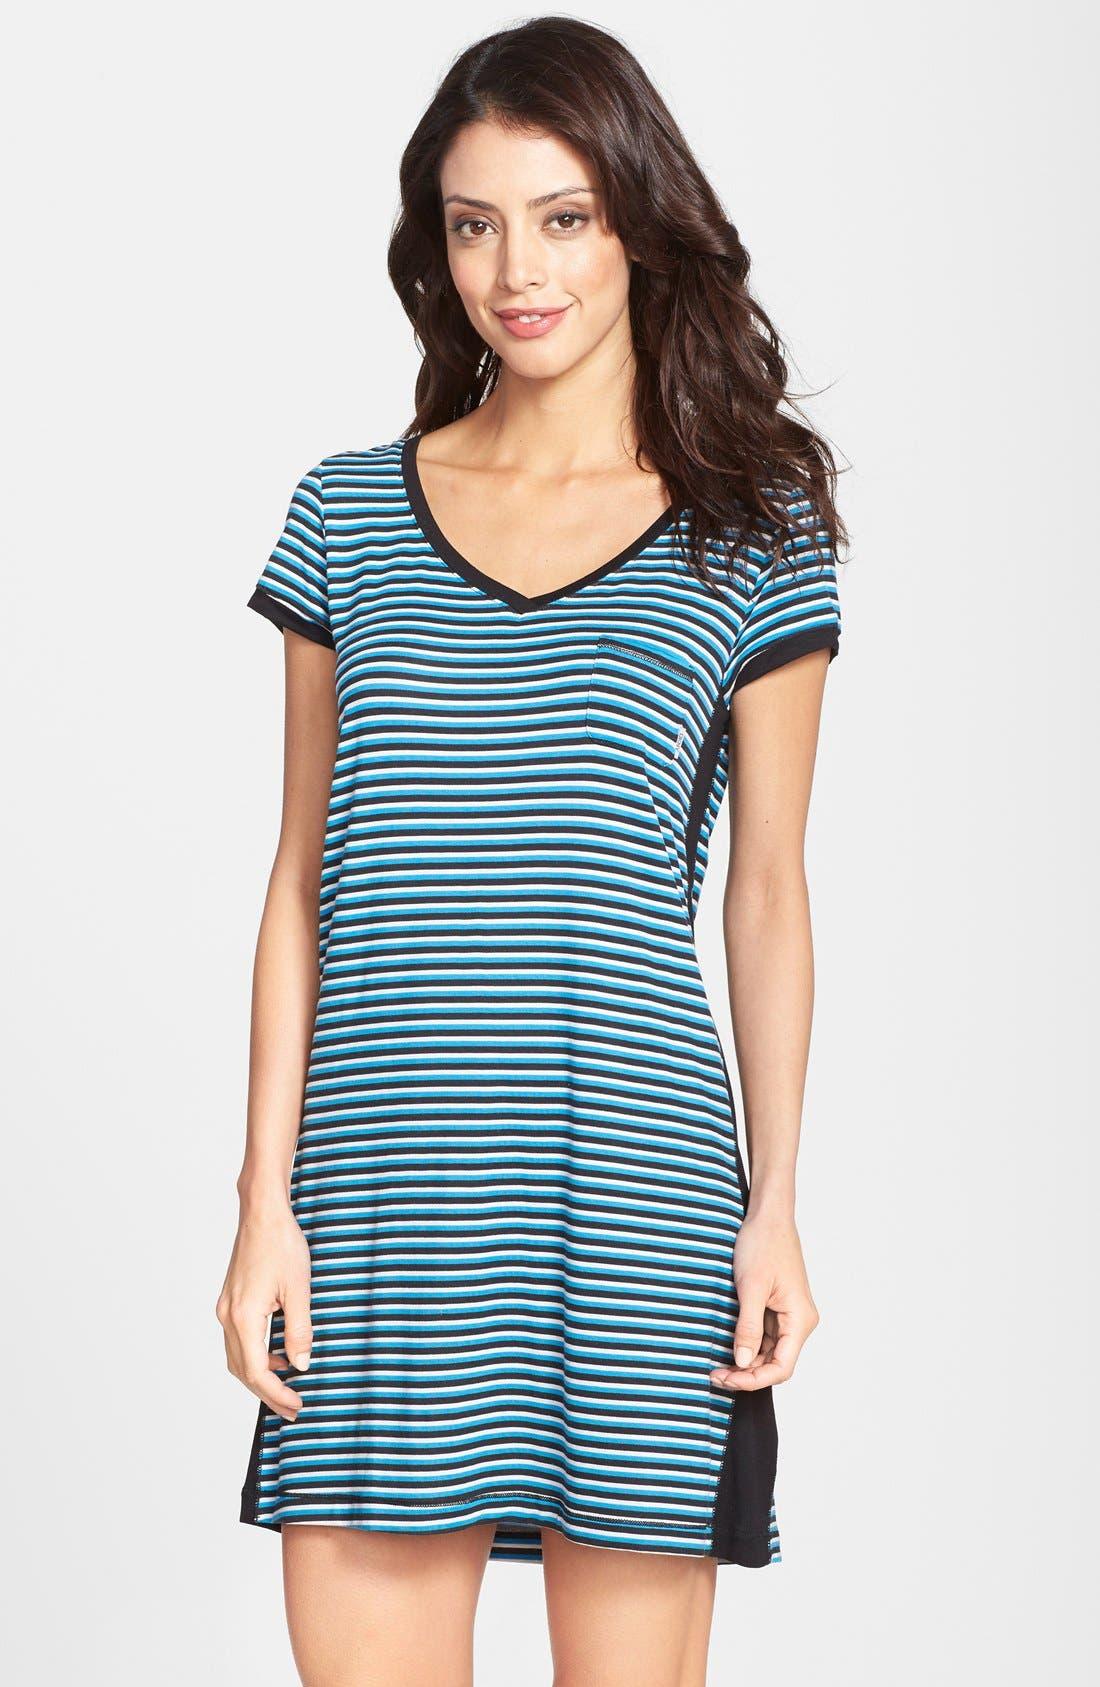 Alternate Image 1 Selected - DKNY 'City Essential' Stripe Jersey Sleep Shirt